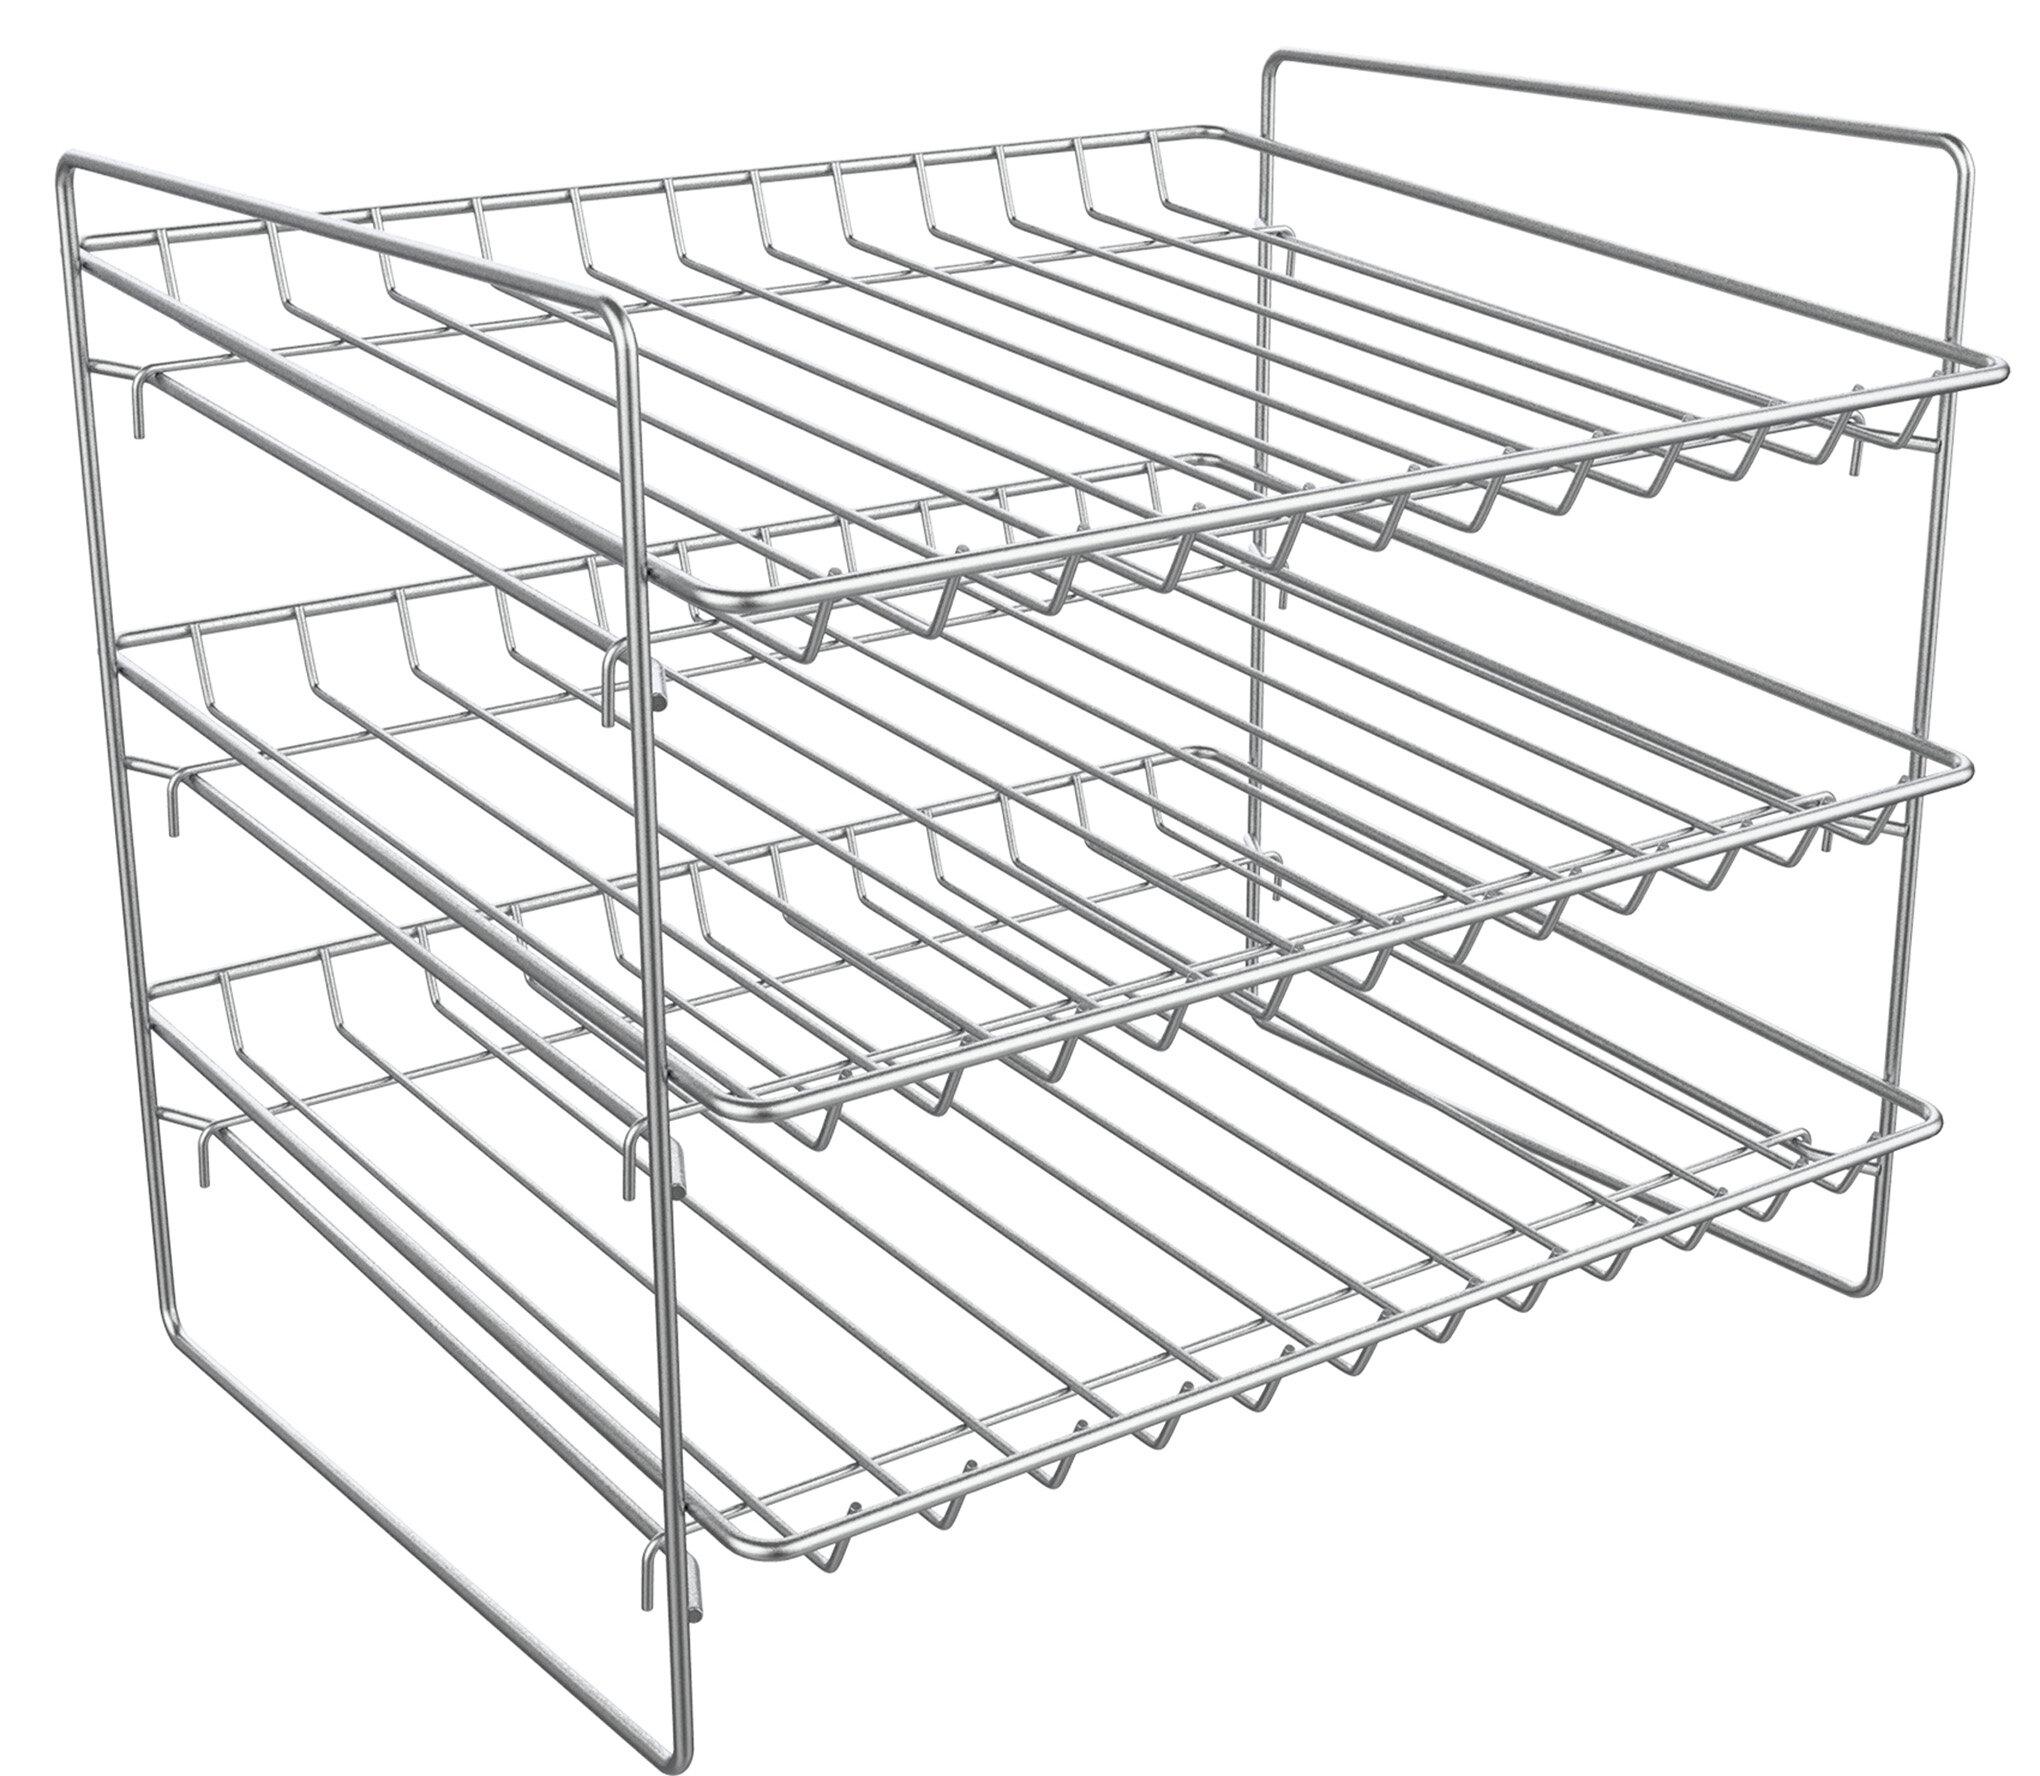 Superieur 3 Tier Can Dispenser Storage Rack